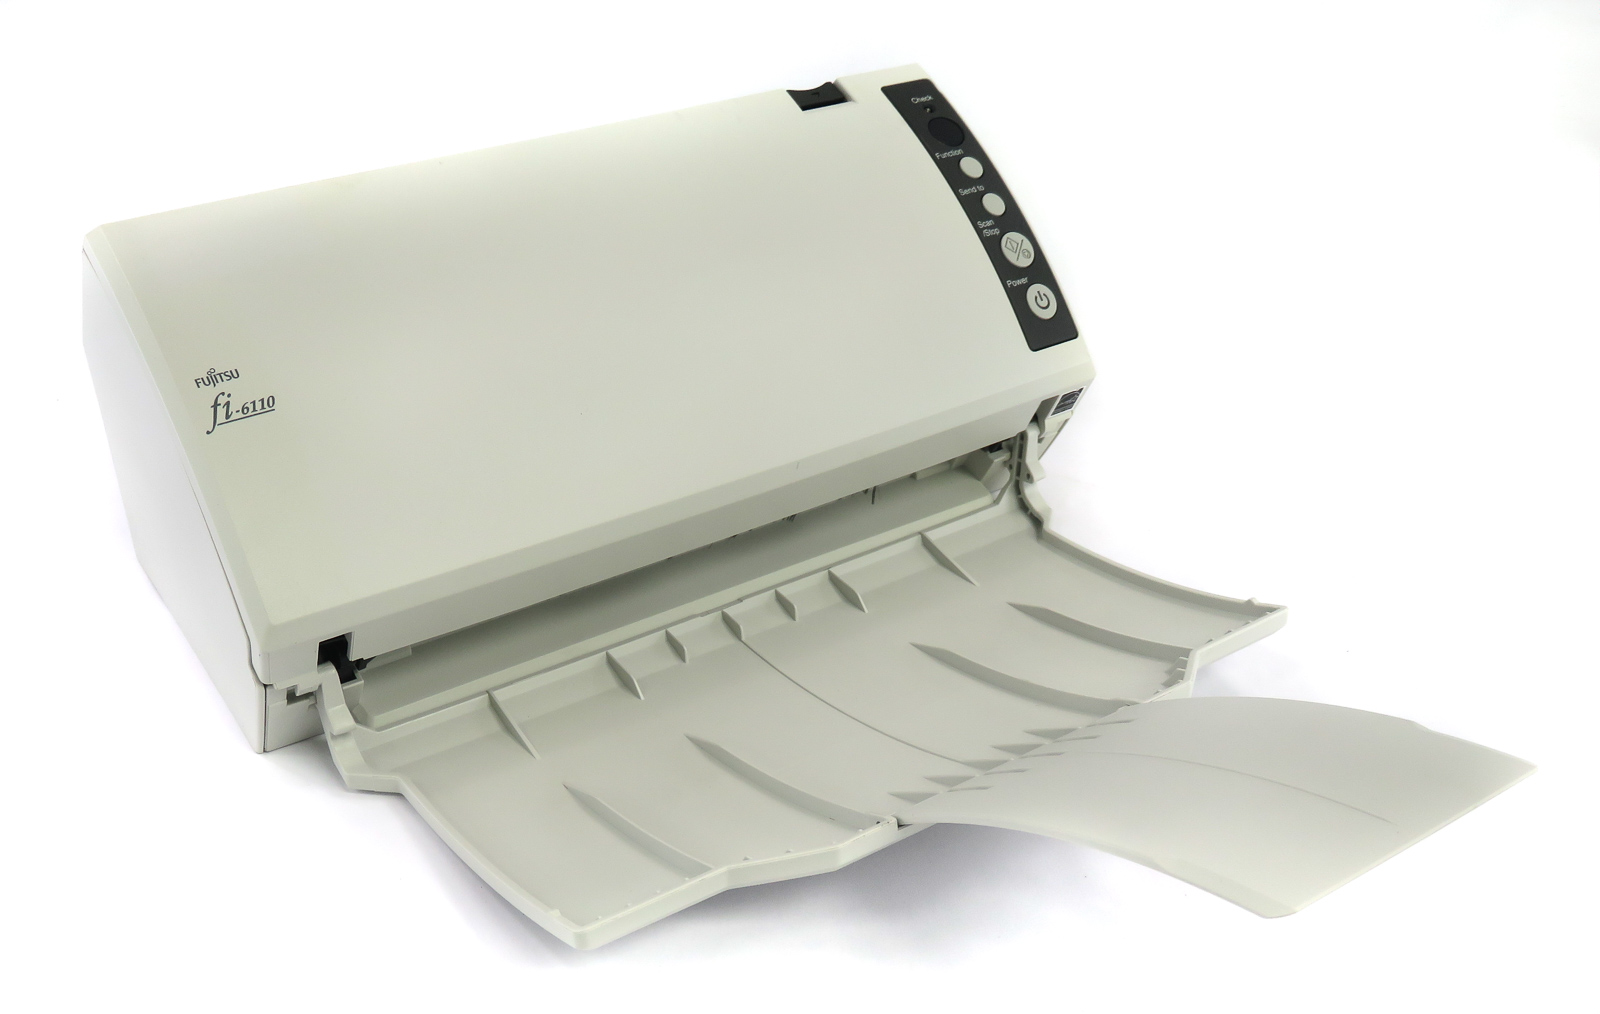 Fujitsu Fi-6110 High Speed Duplex Desktop Document Scanner